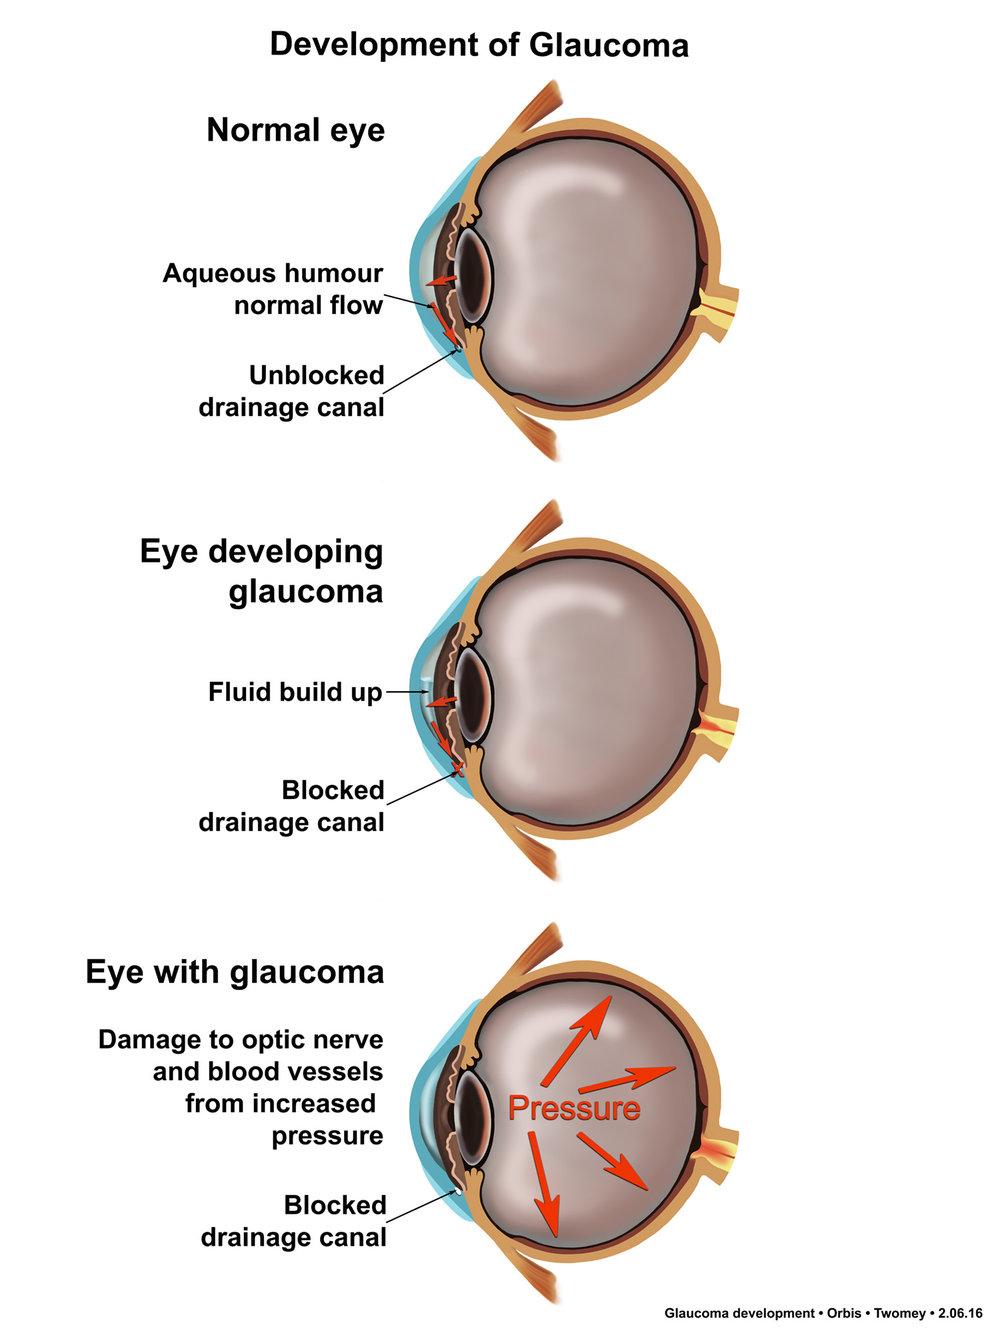 glaucomaforming1500.jpg